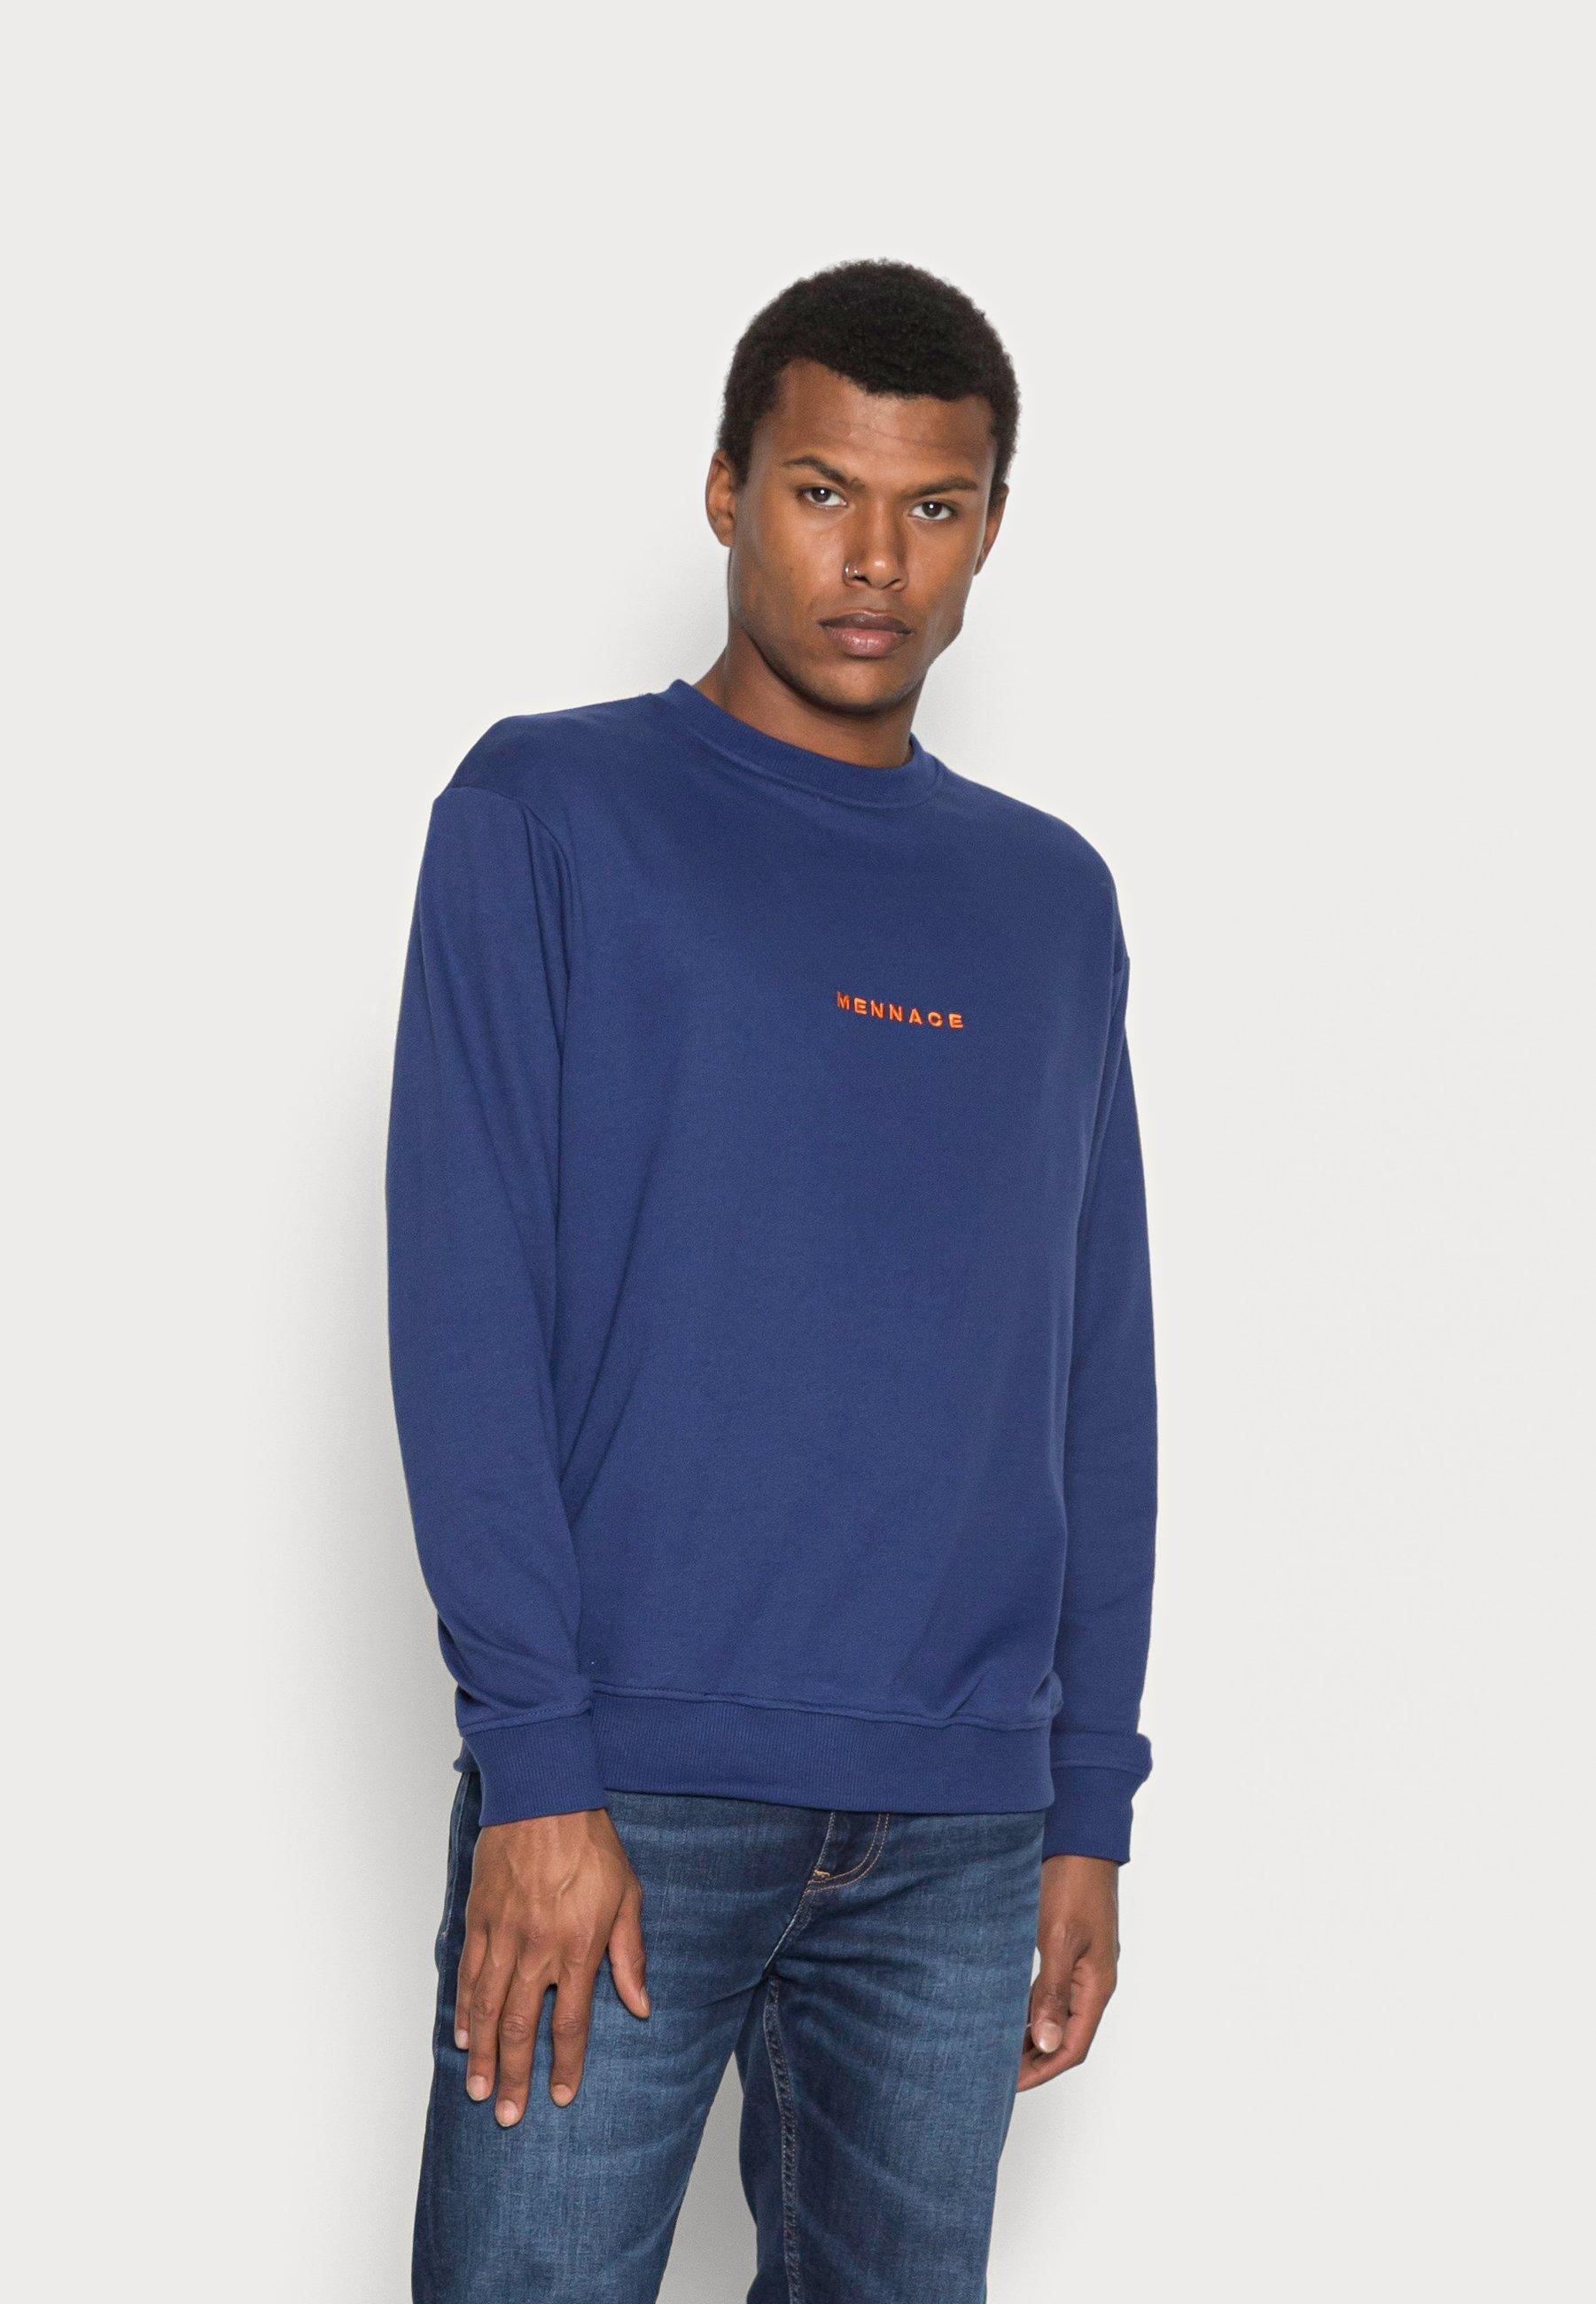 Women MENNACE UNISEX ESSENTIAL REGULAR - Sweatshirt